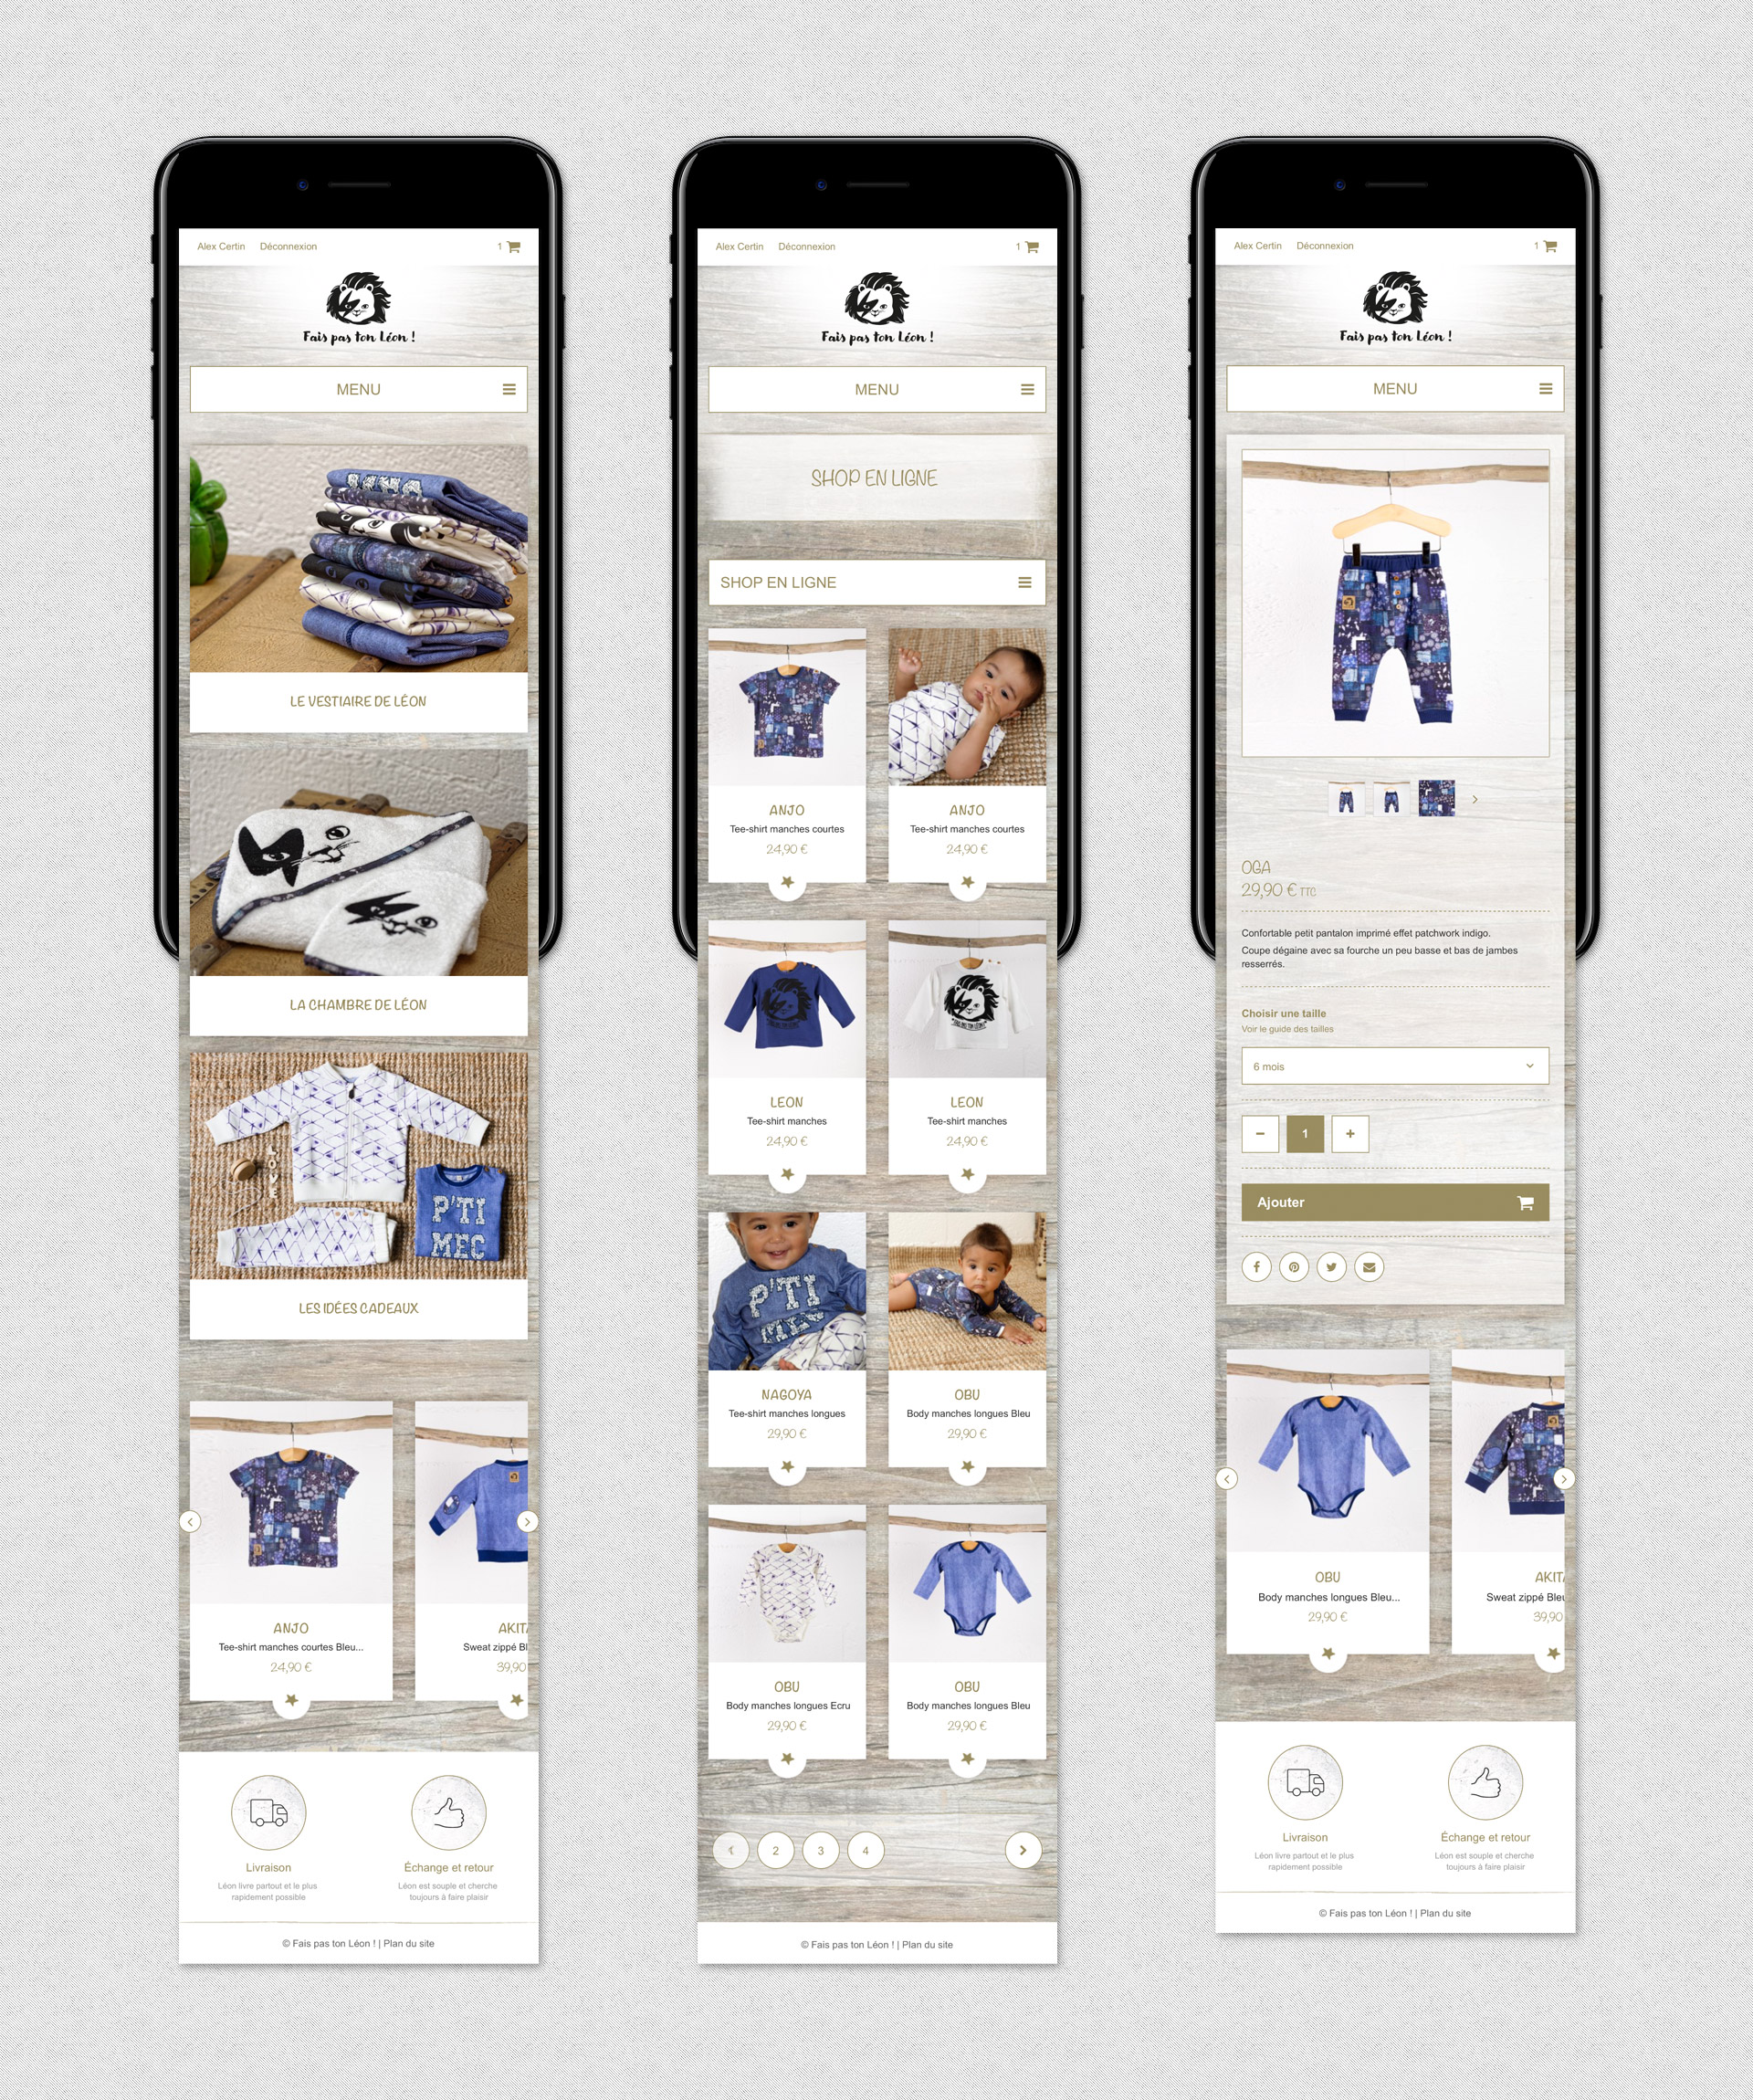 faispastonleon-creation-site-e-commerce-mobile-caconcept-alexis-cretin-graphiste-montpellier